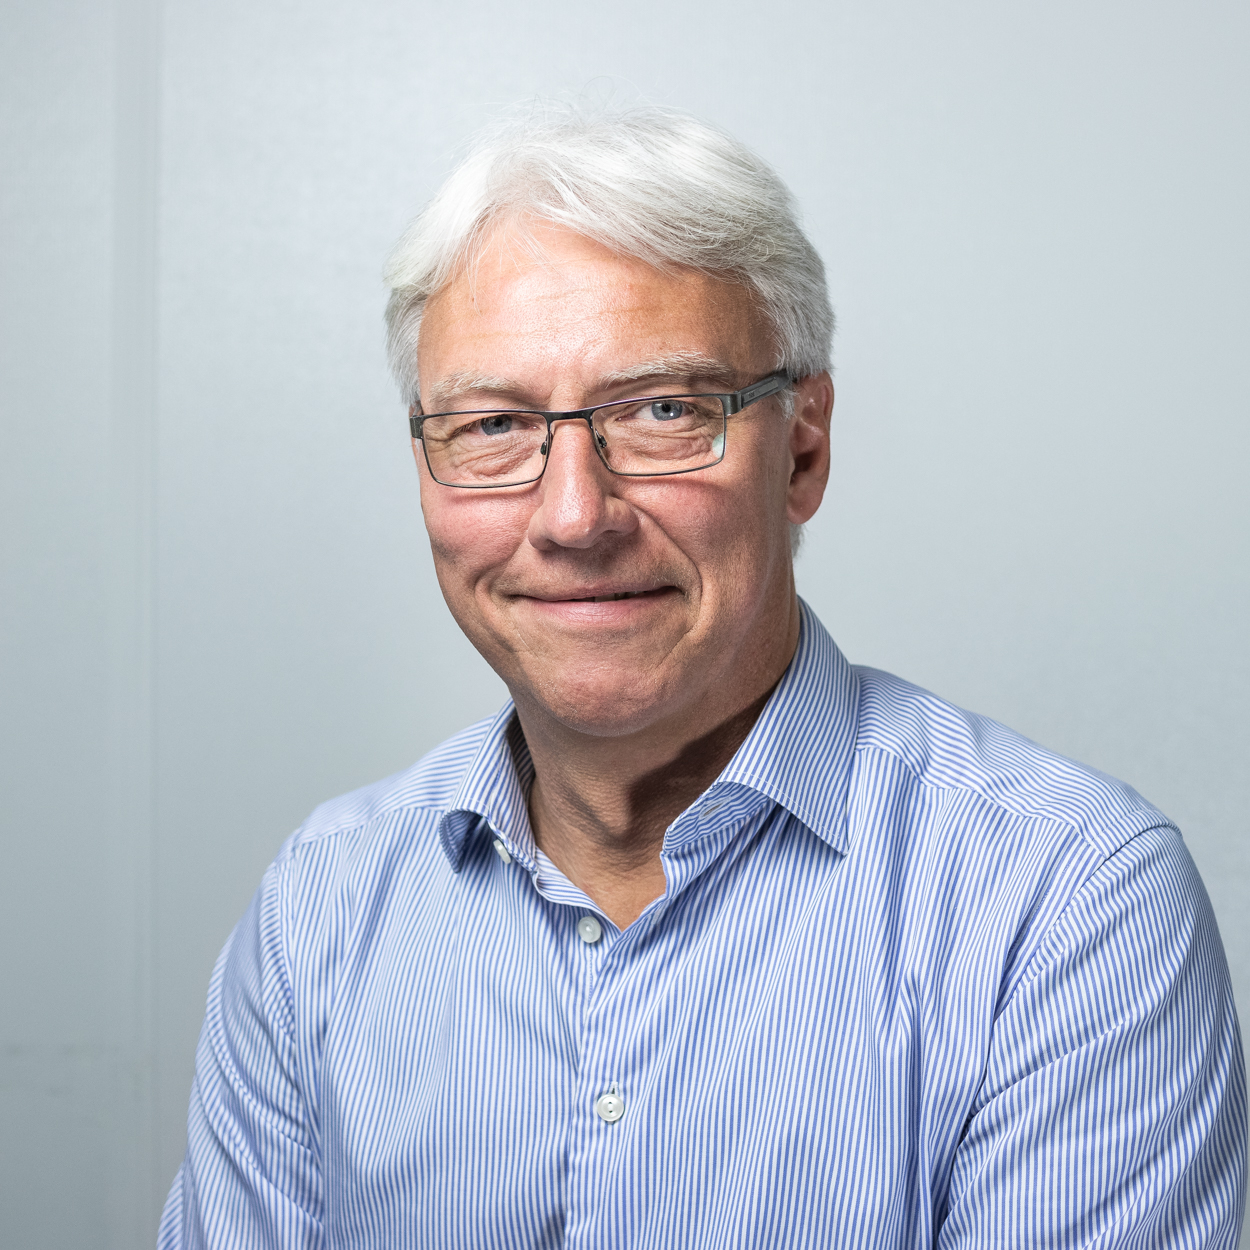 Michael L. Olafsson